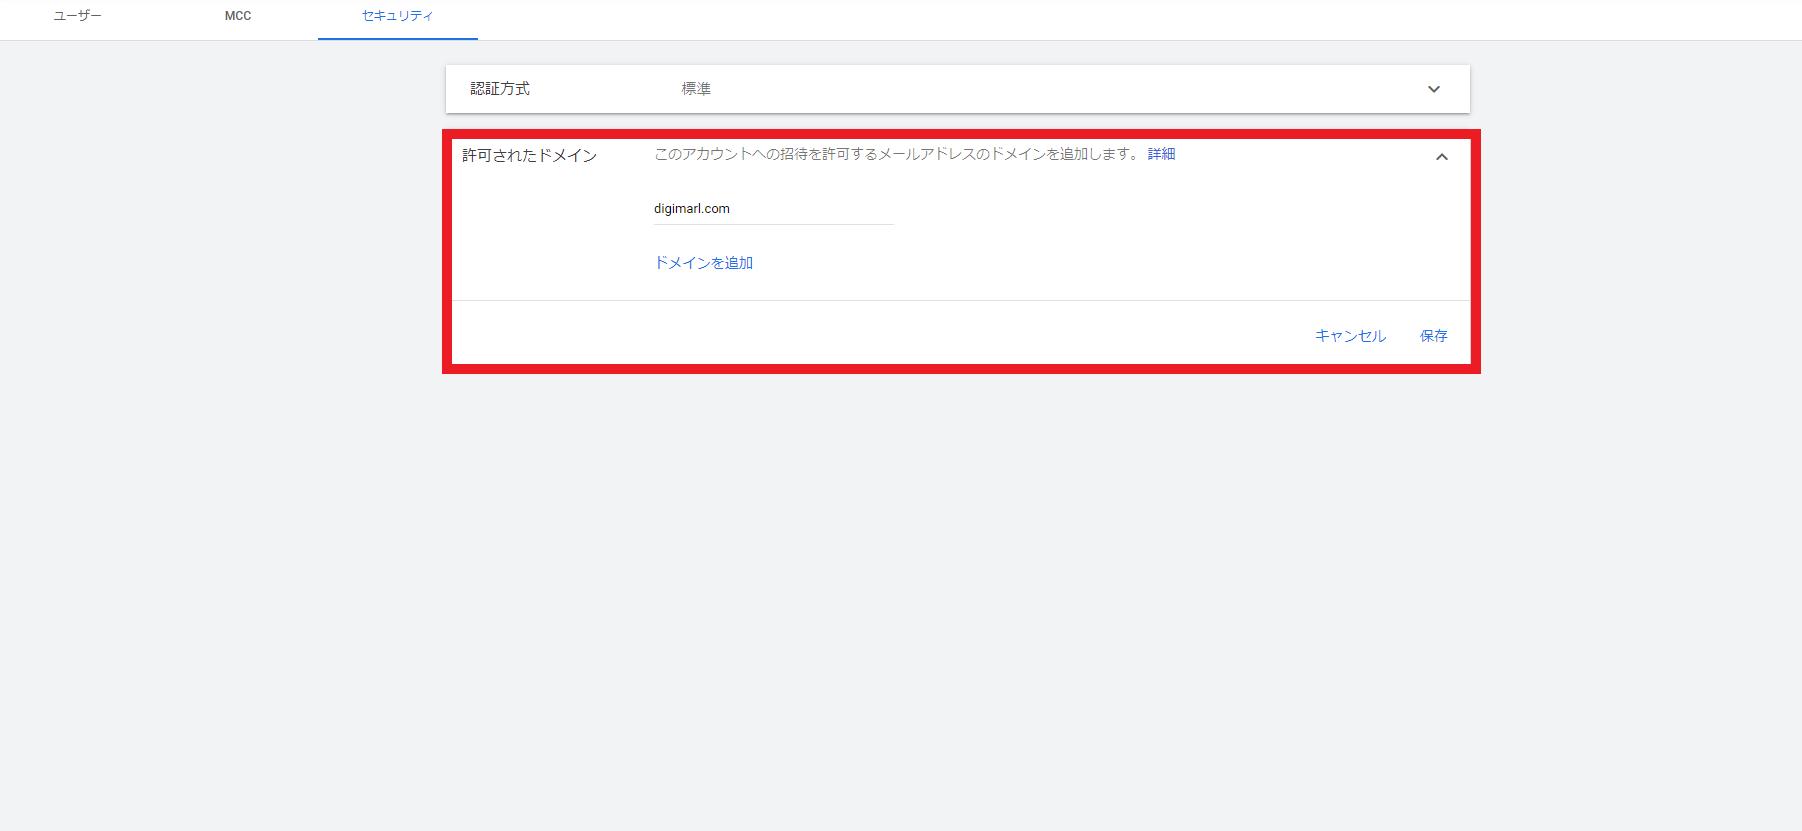 Google広告の許可されたドメイン